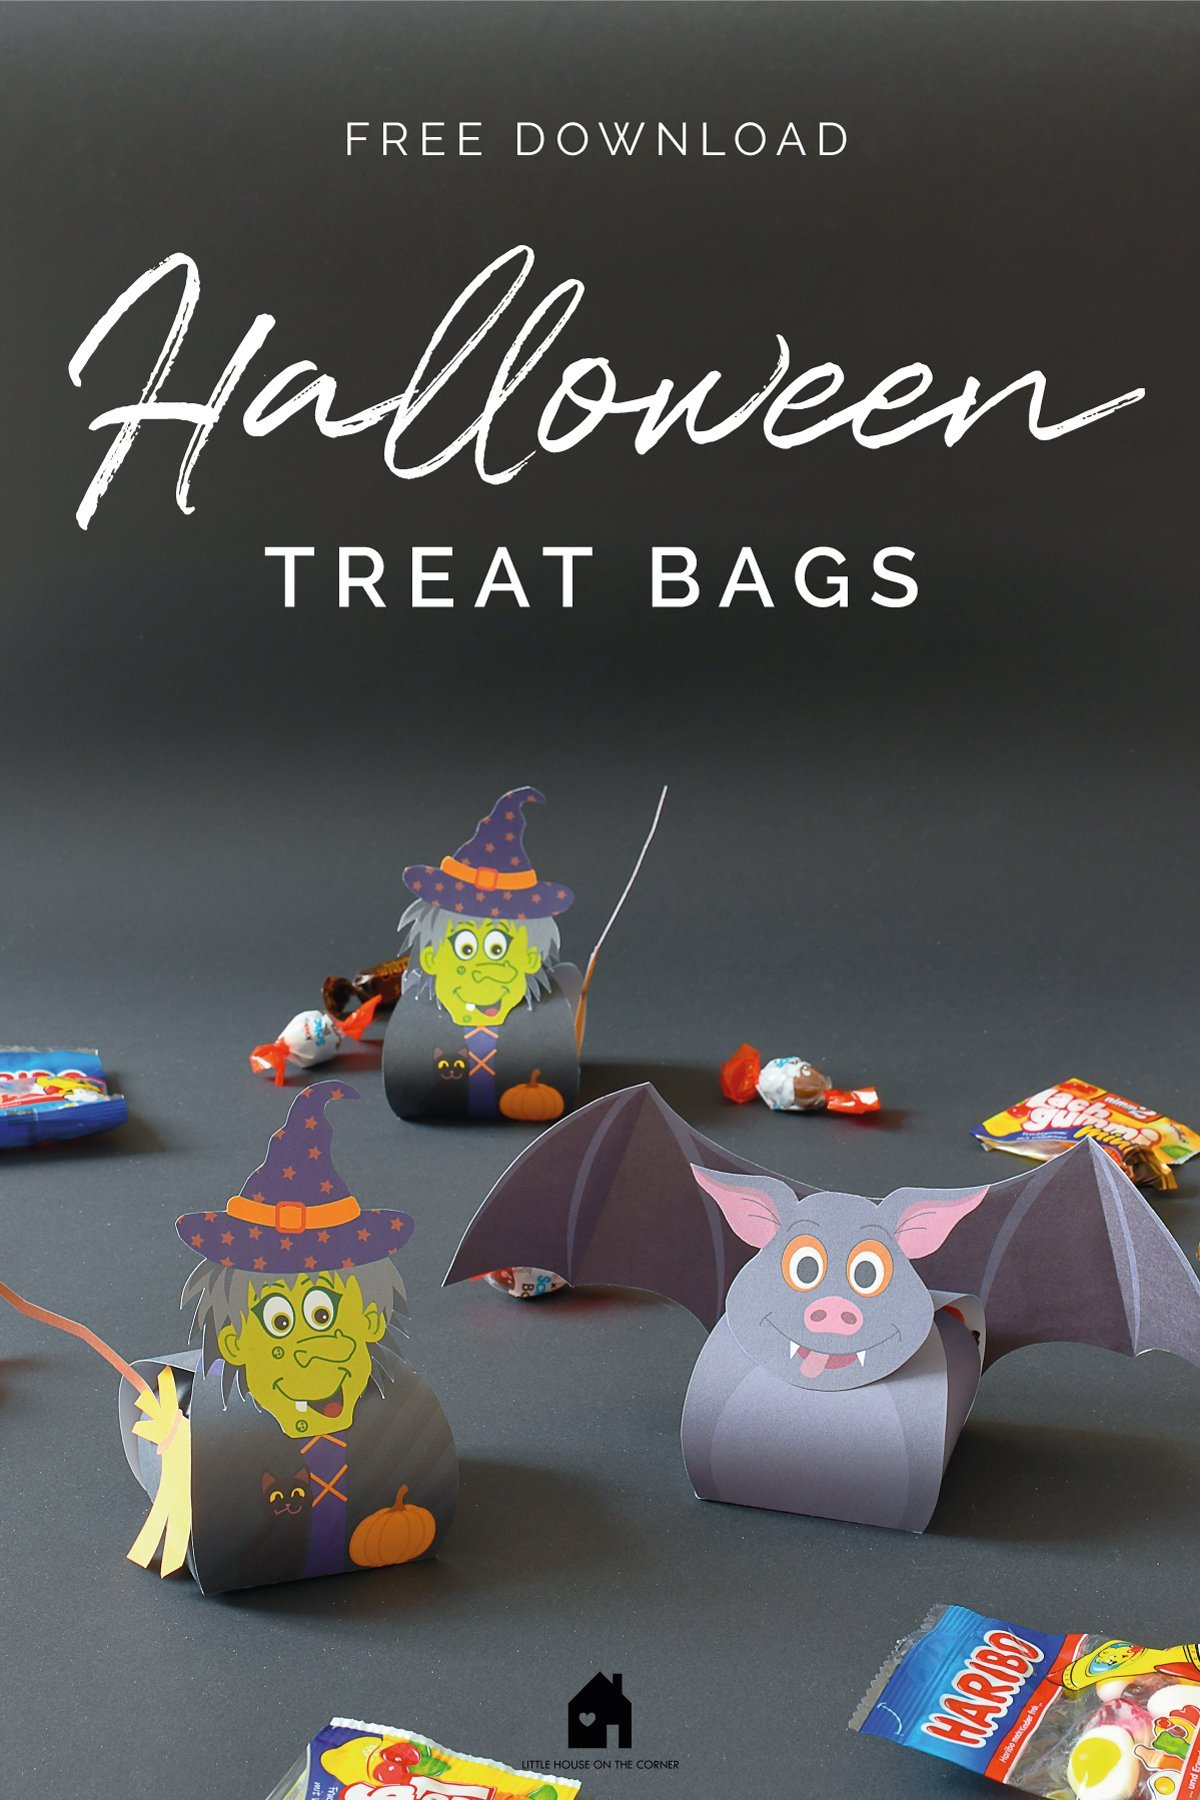 Halloween Treat Bags - Bat Treat Bag - Witch Treat Bag | Little House On The Corner